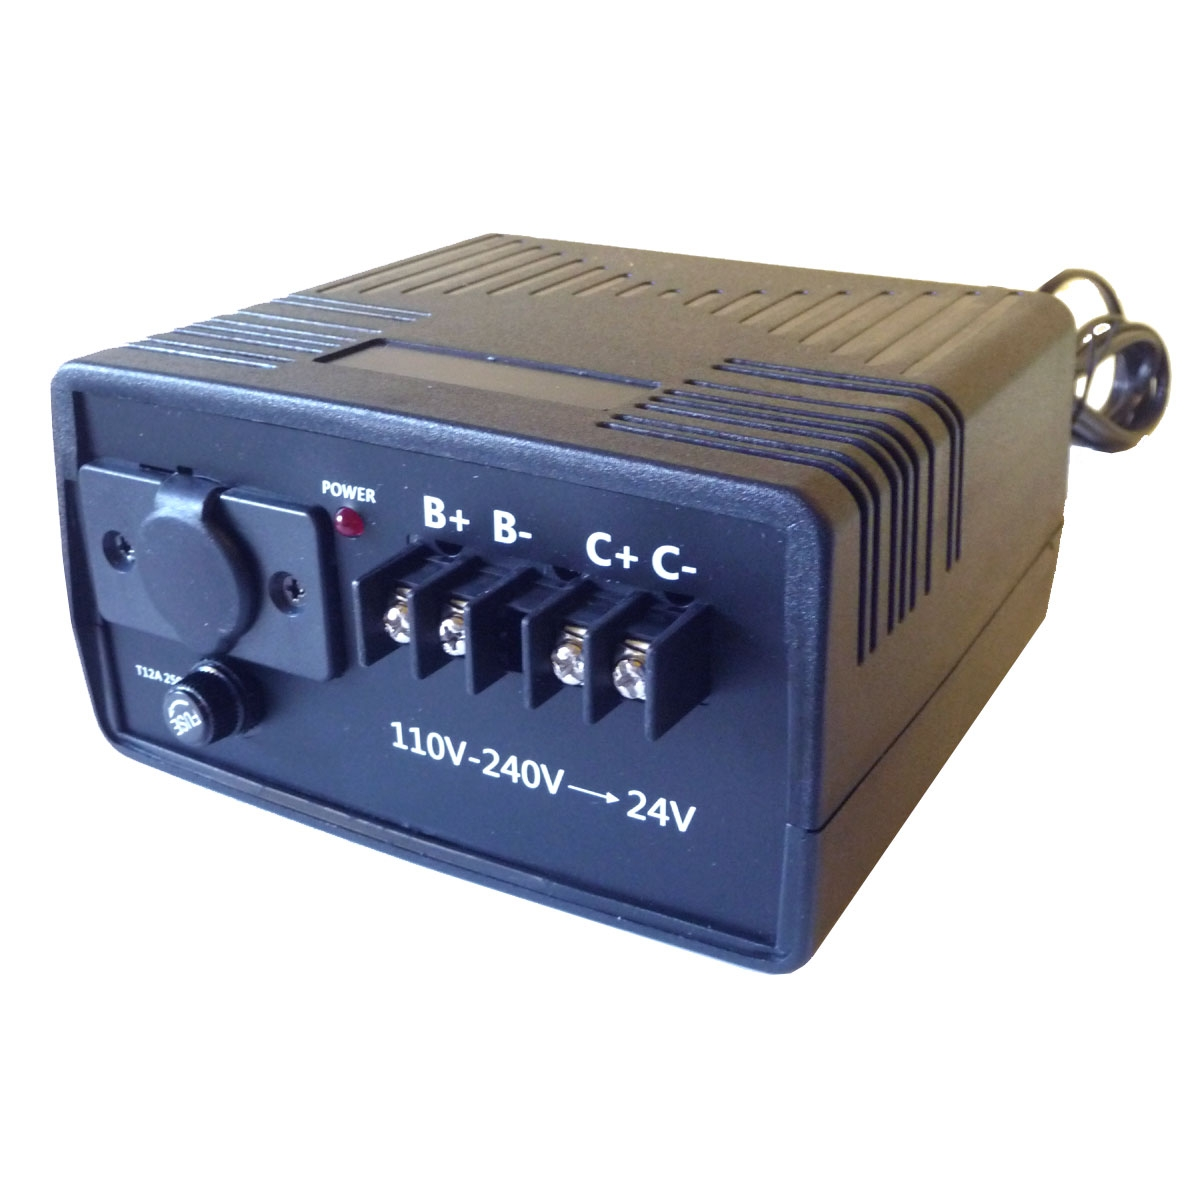 230V zu 24V DC Konverter für Engel Kühlbox 60 und 80L